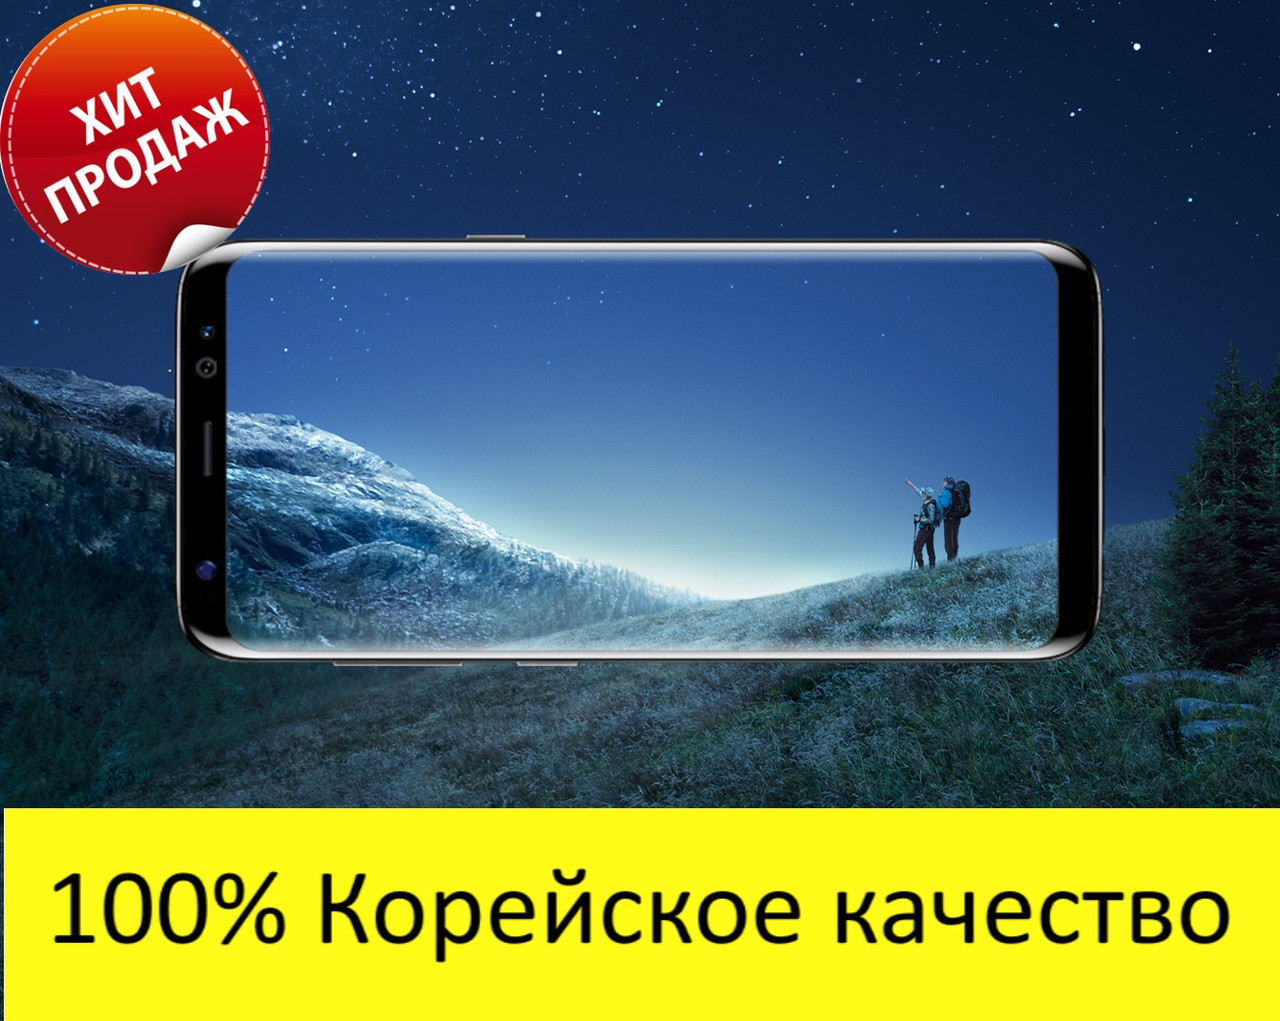 Скидка на смартфон  Samsung  S9 c Гарантией 1 ГОД самсунг s6/s8